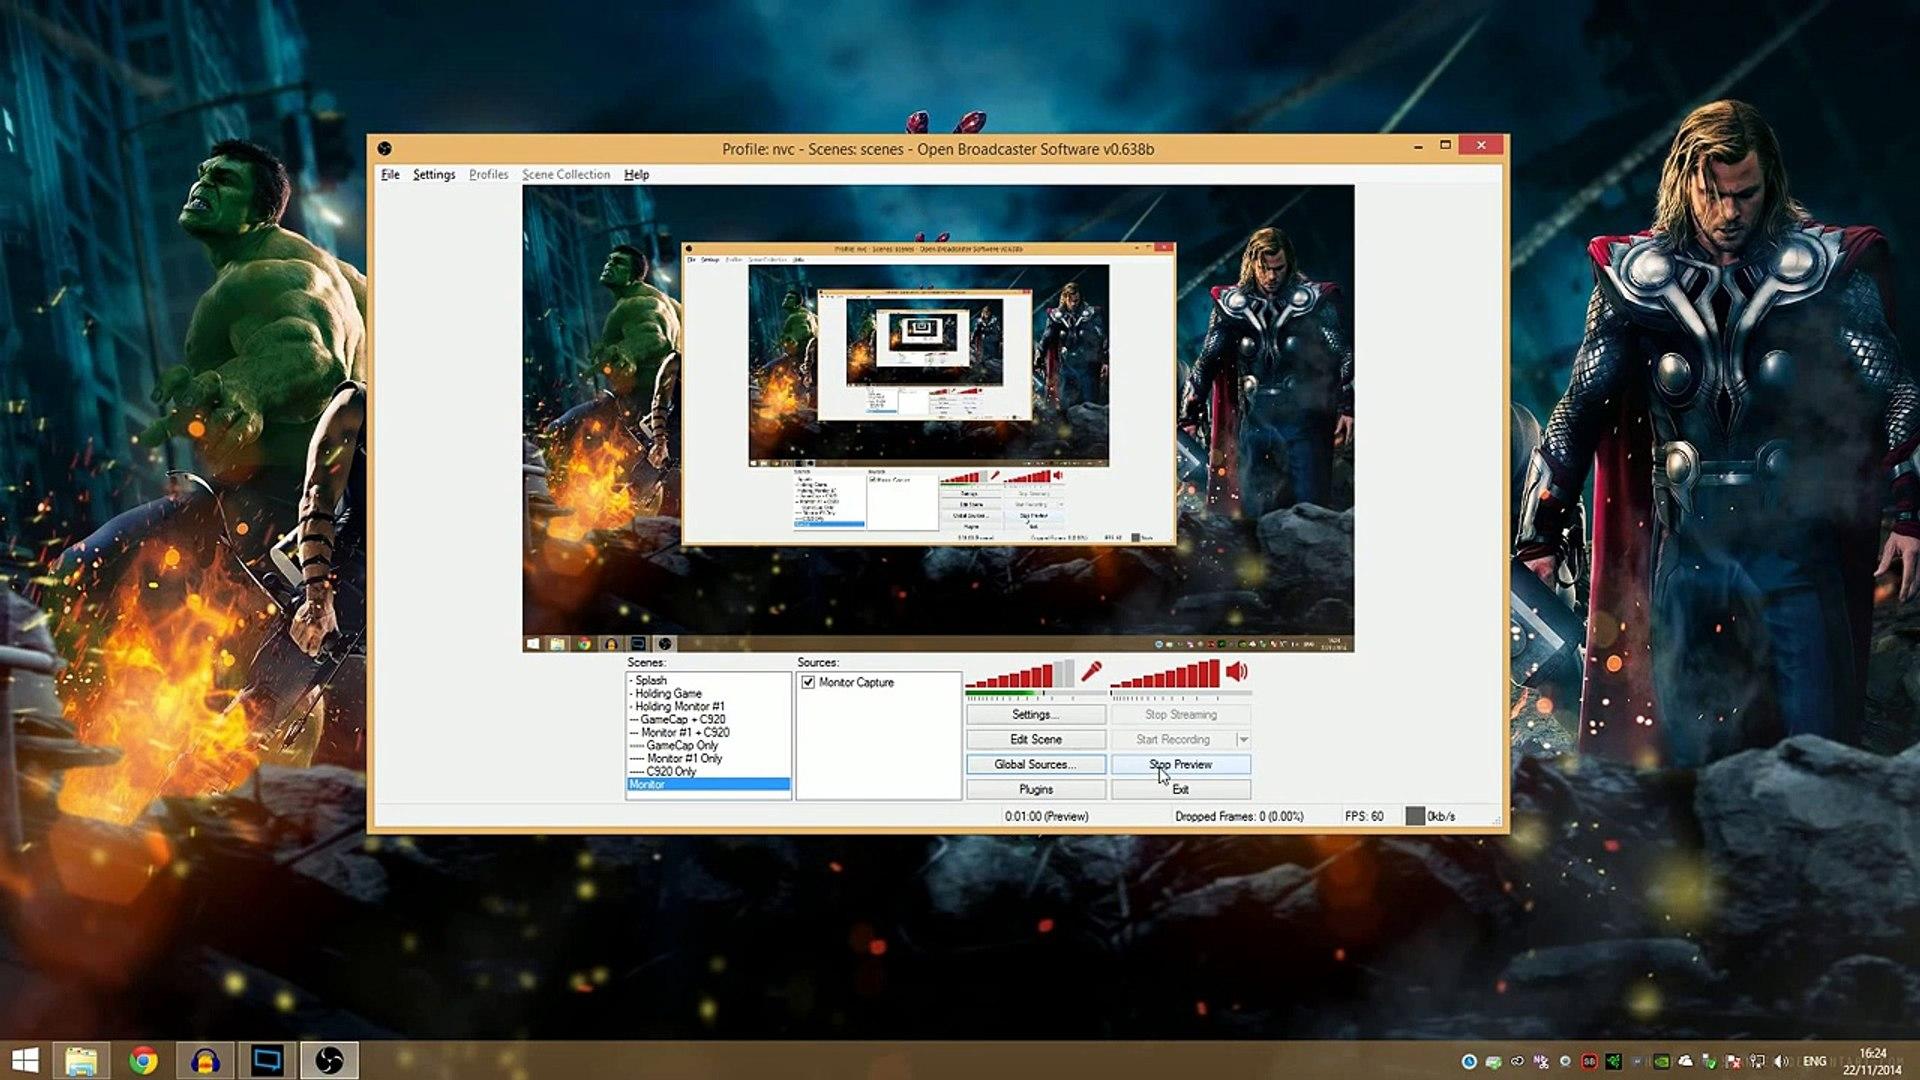 60FPS Livestream Encoding in OBS: x264 vs Intel QuickSync vs Nvidia NVENC